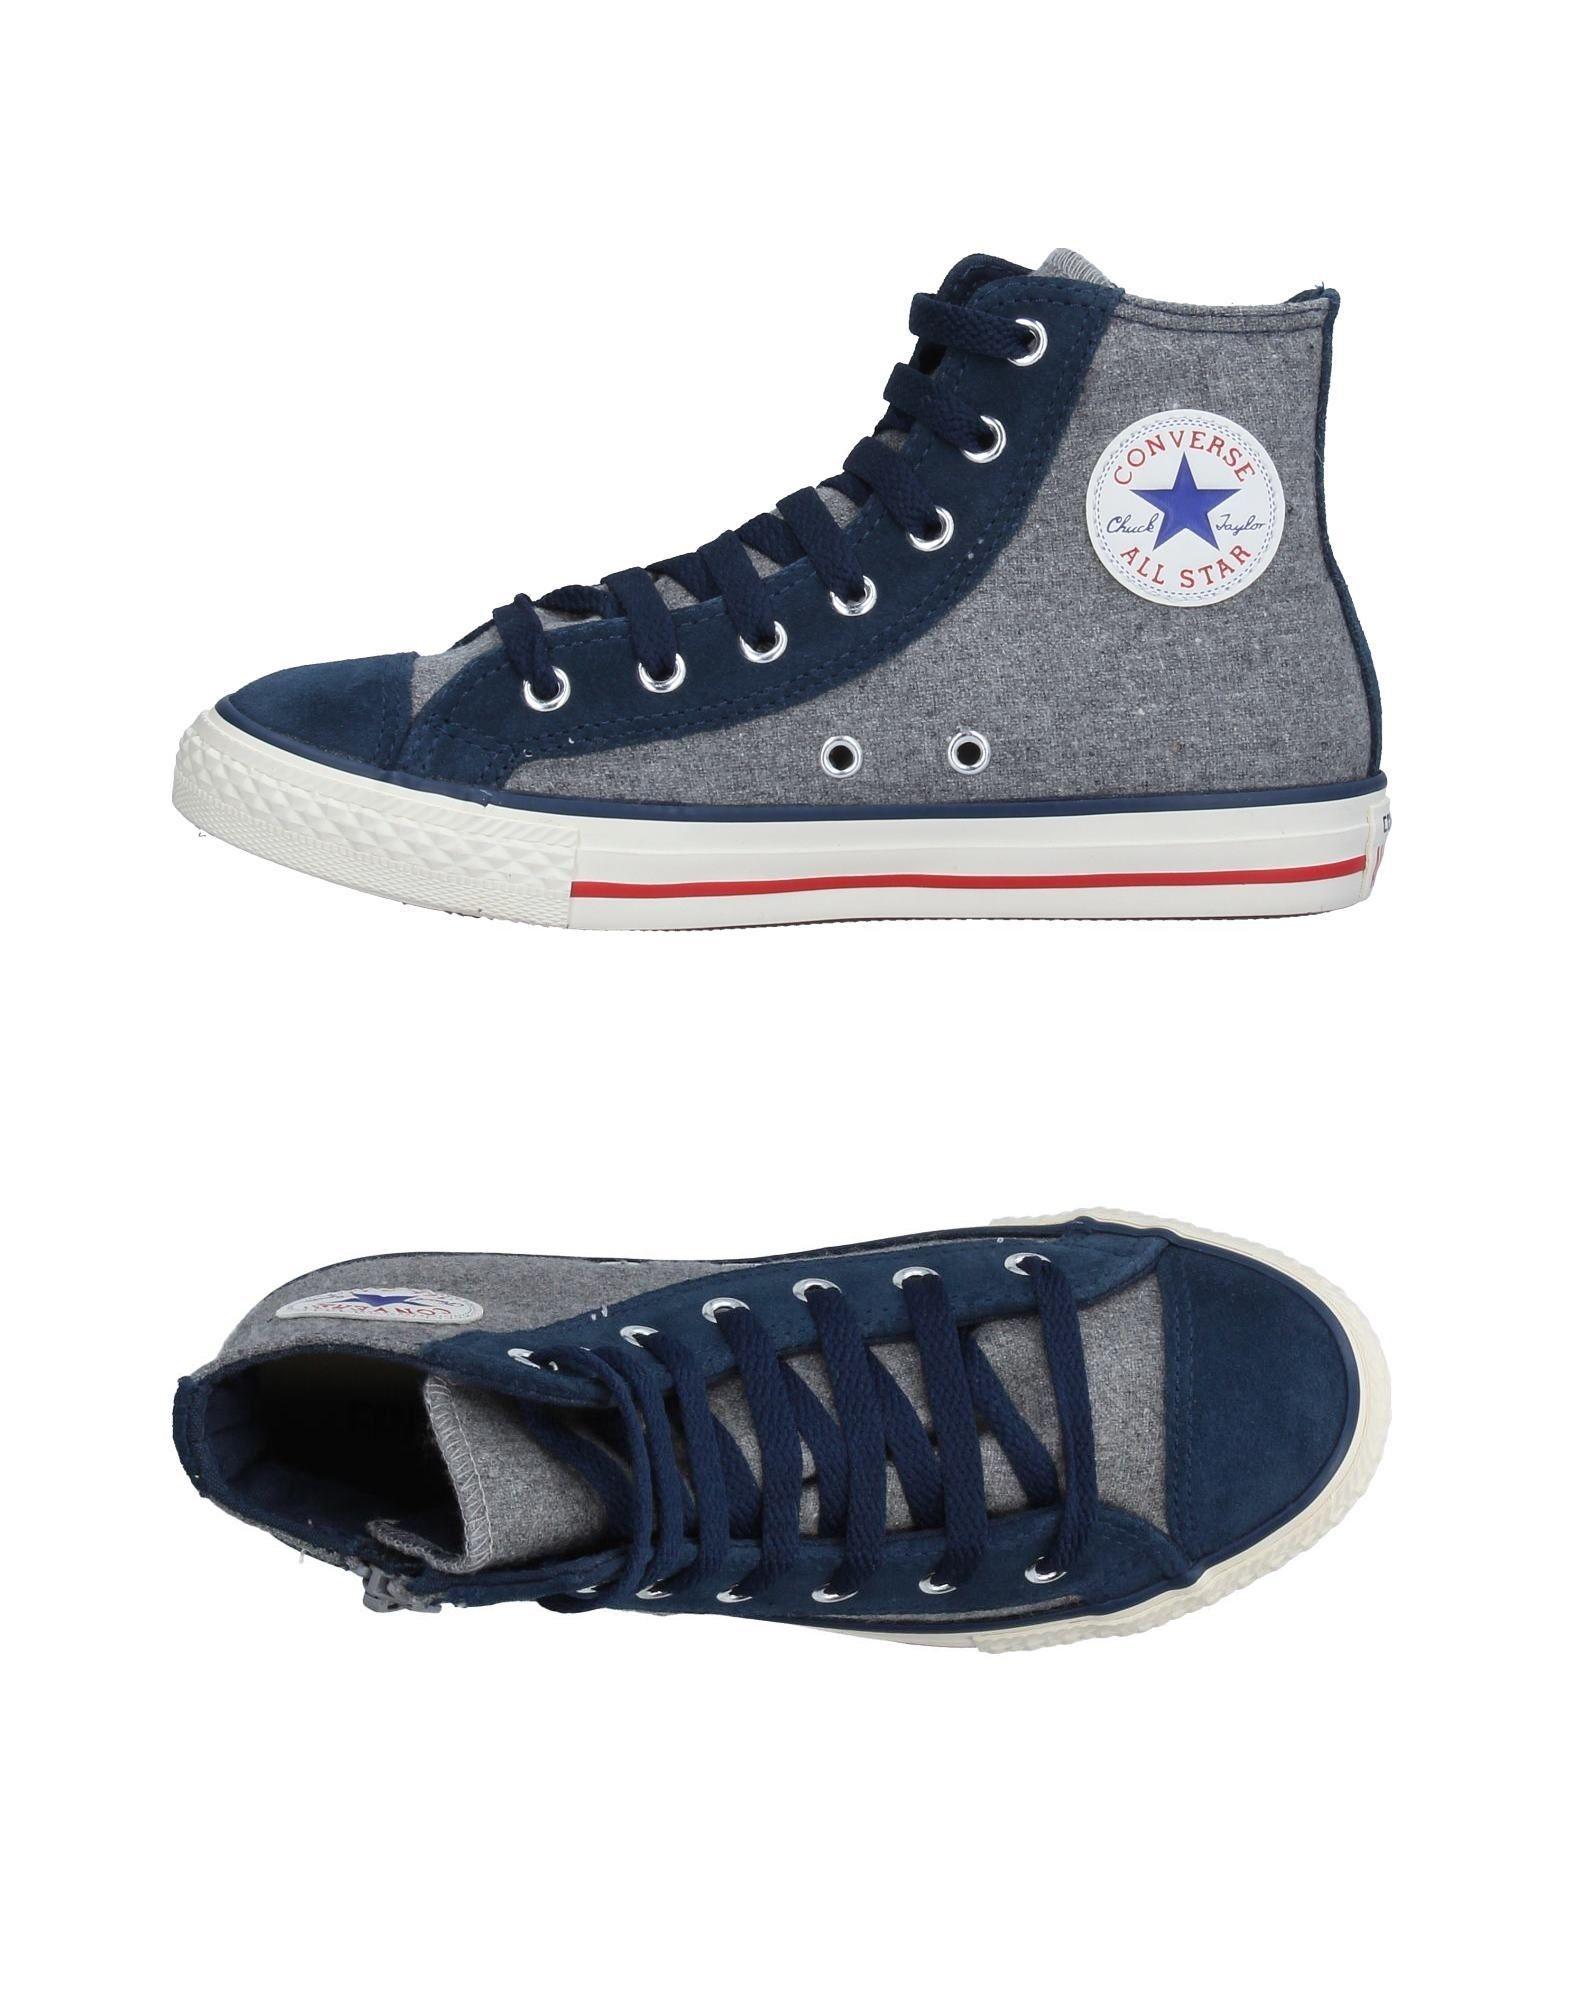 CONVERSE ALL STAR Jungen 9-16 jahre High Sneakers & Tennisschuhe Farbe Grau Größe 30